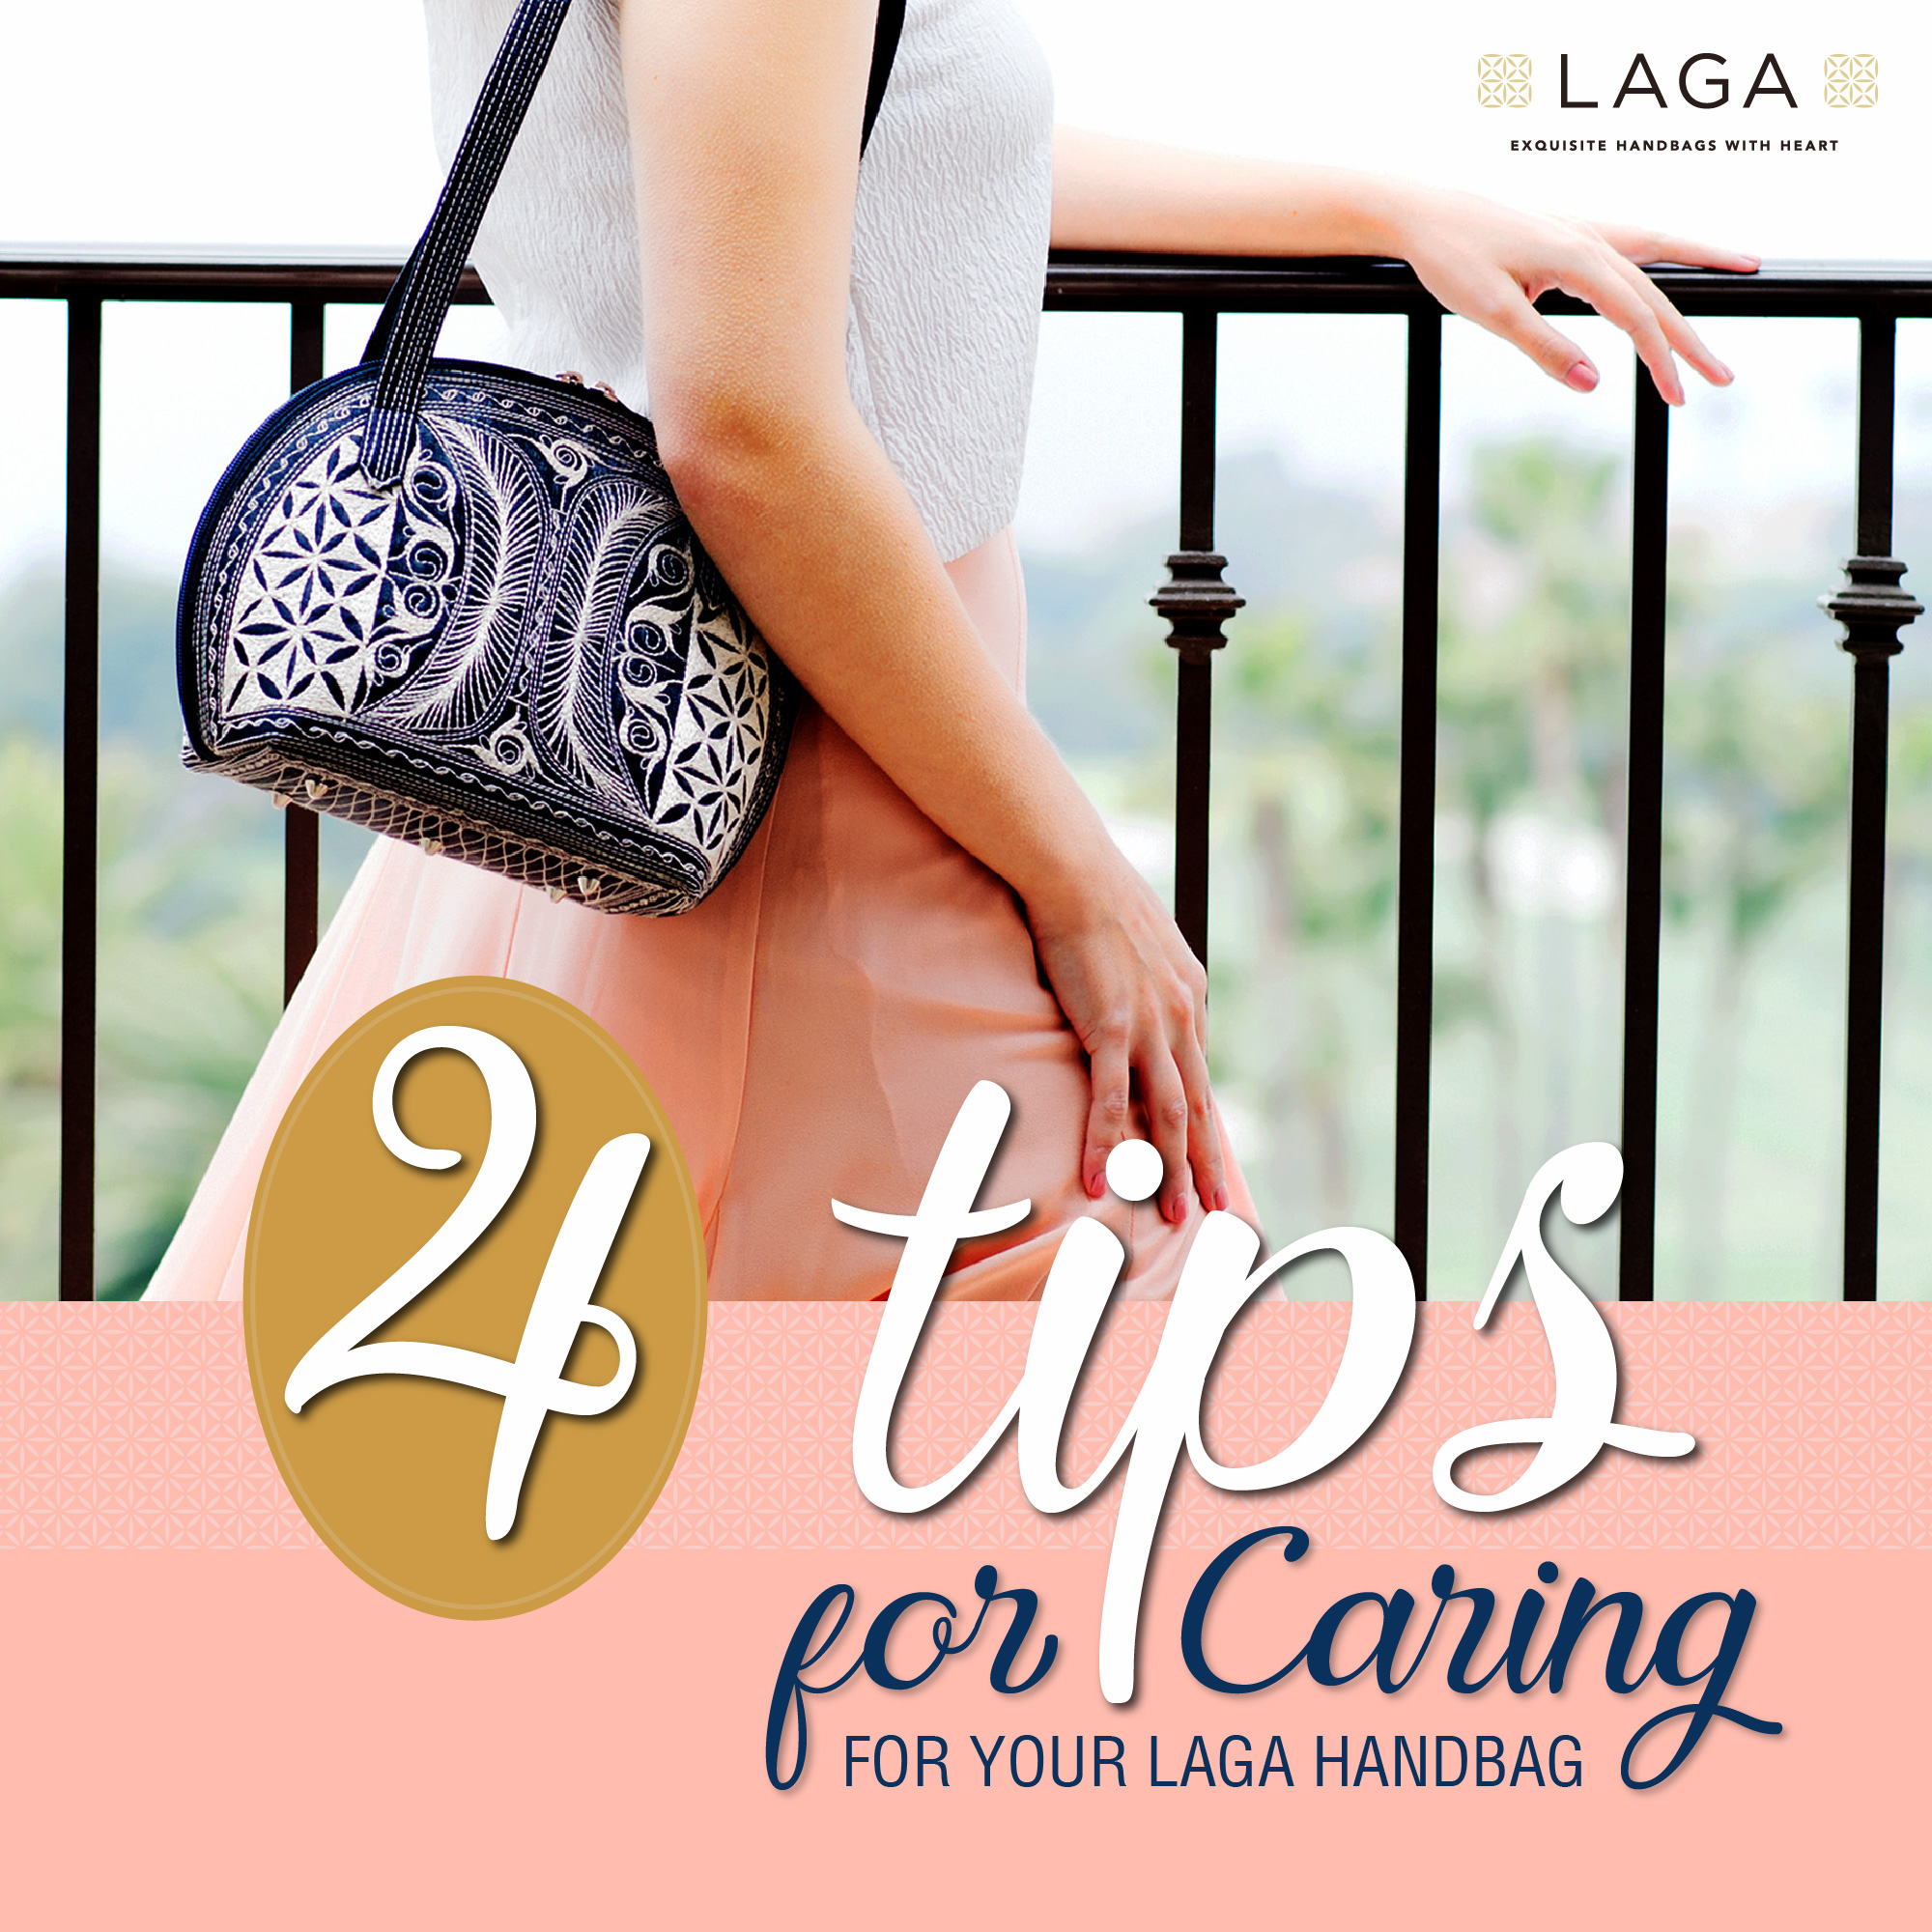 Laga Handbags | 4 Tips for Caring for Your Laga Handbag